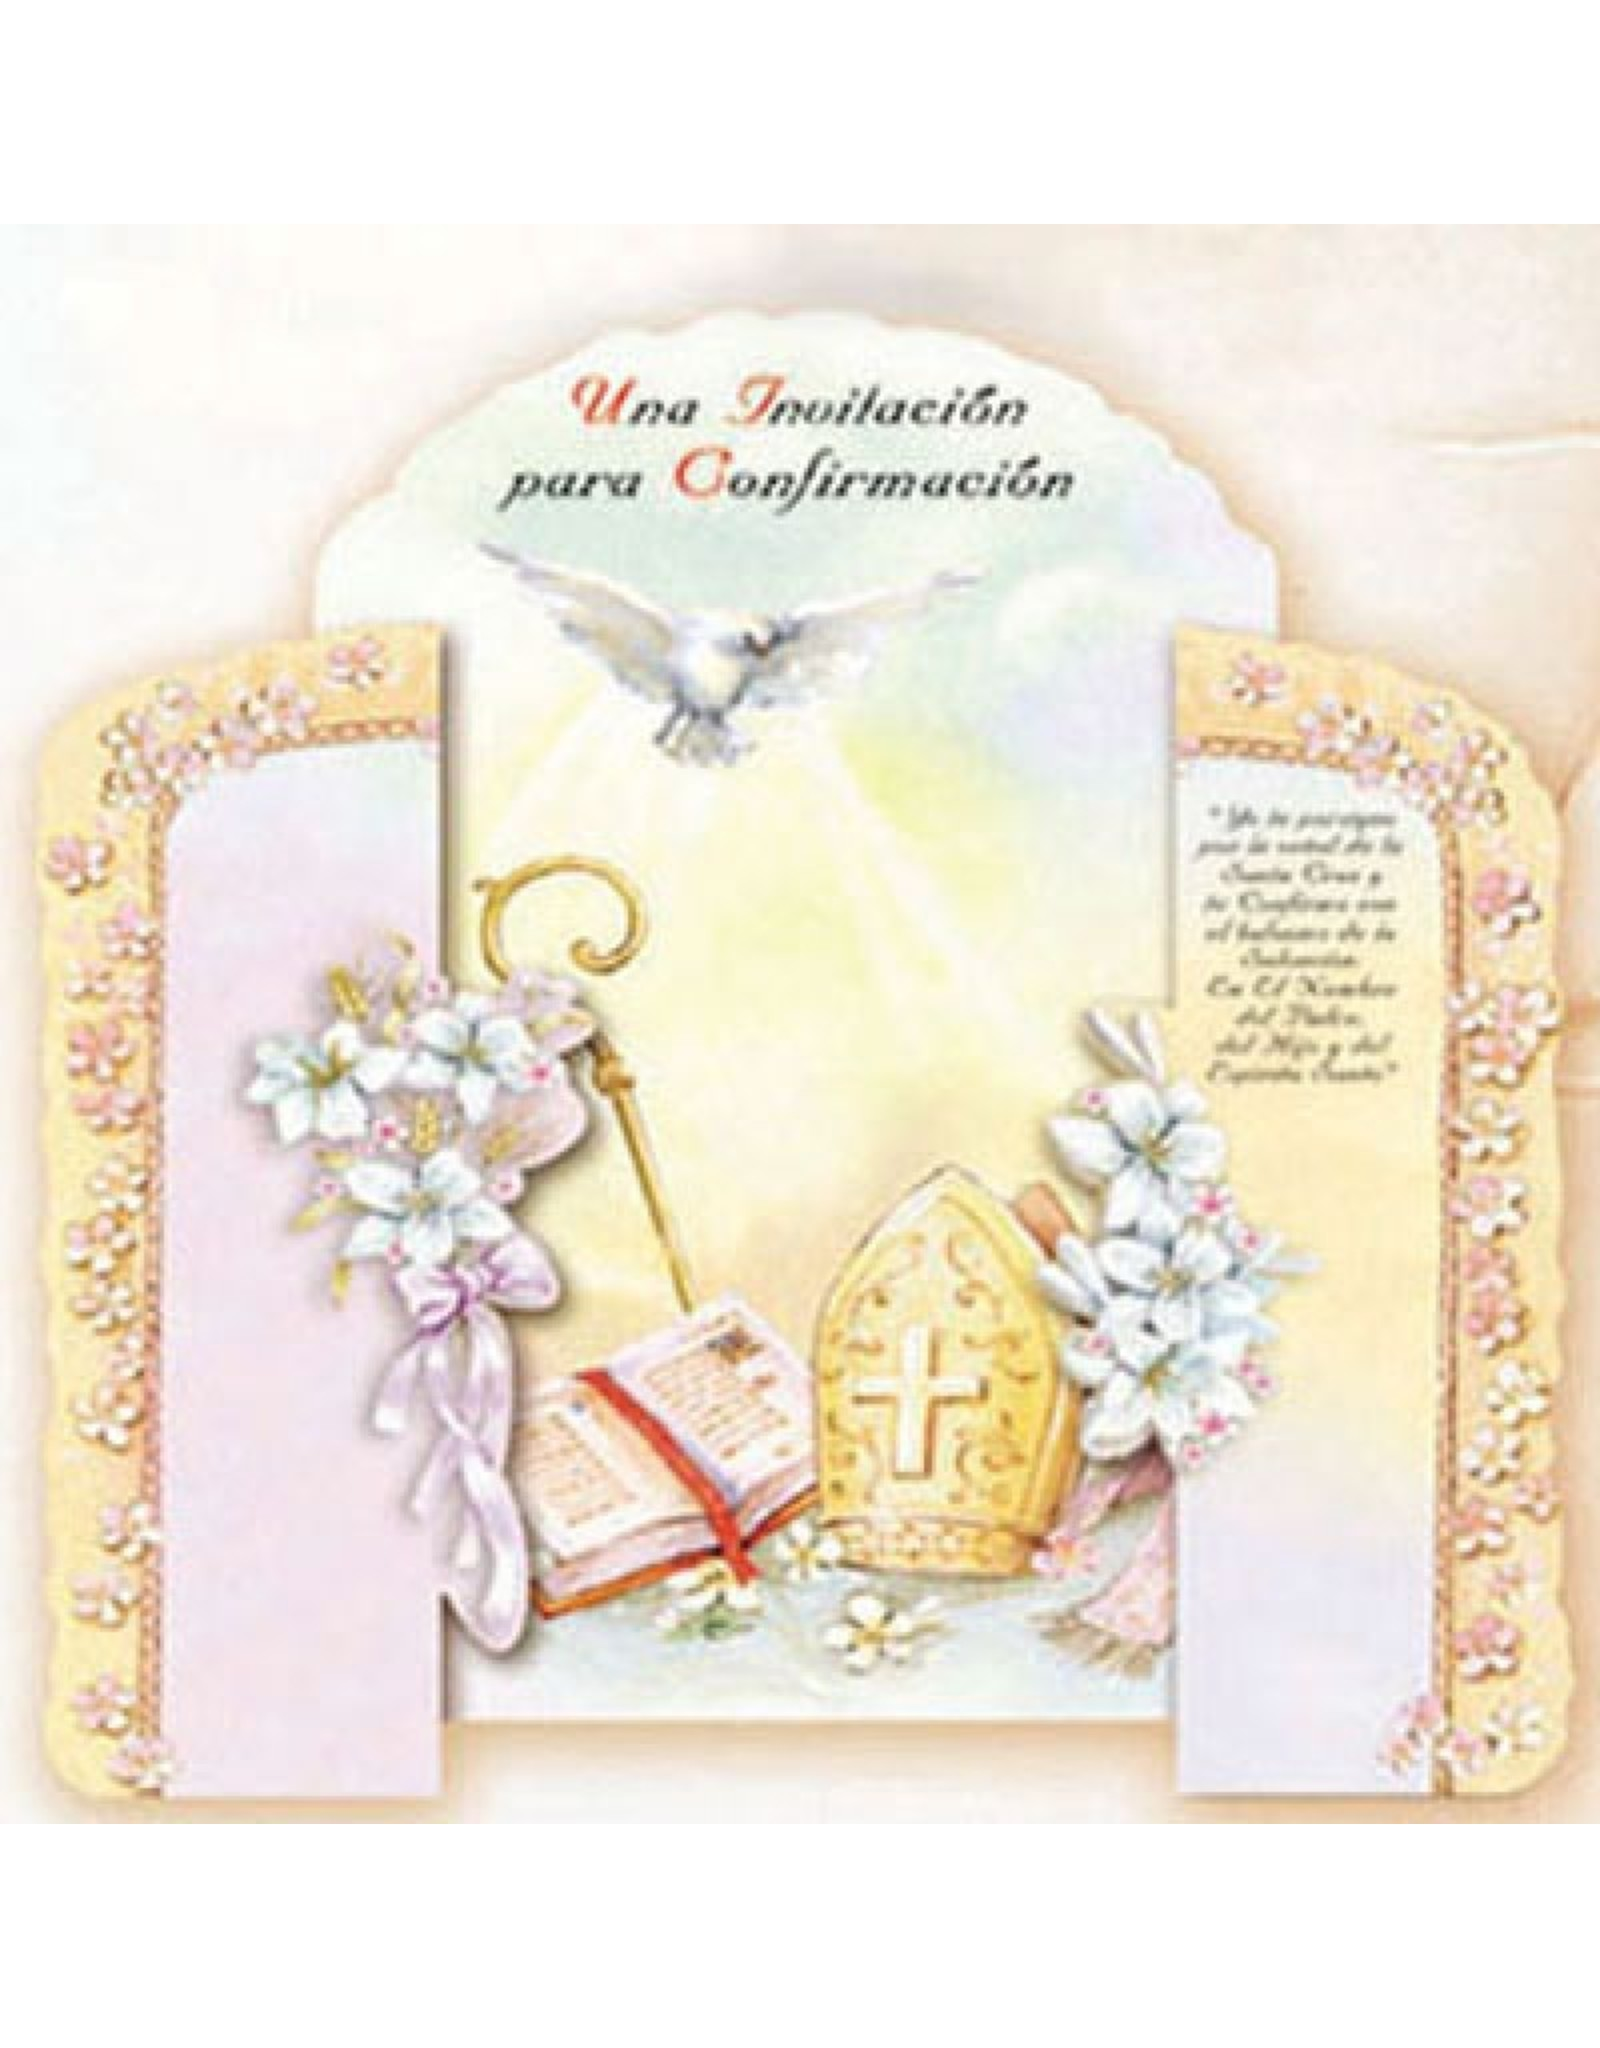 Confirmation Invitation (Spanish)